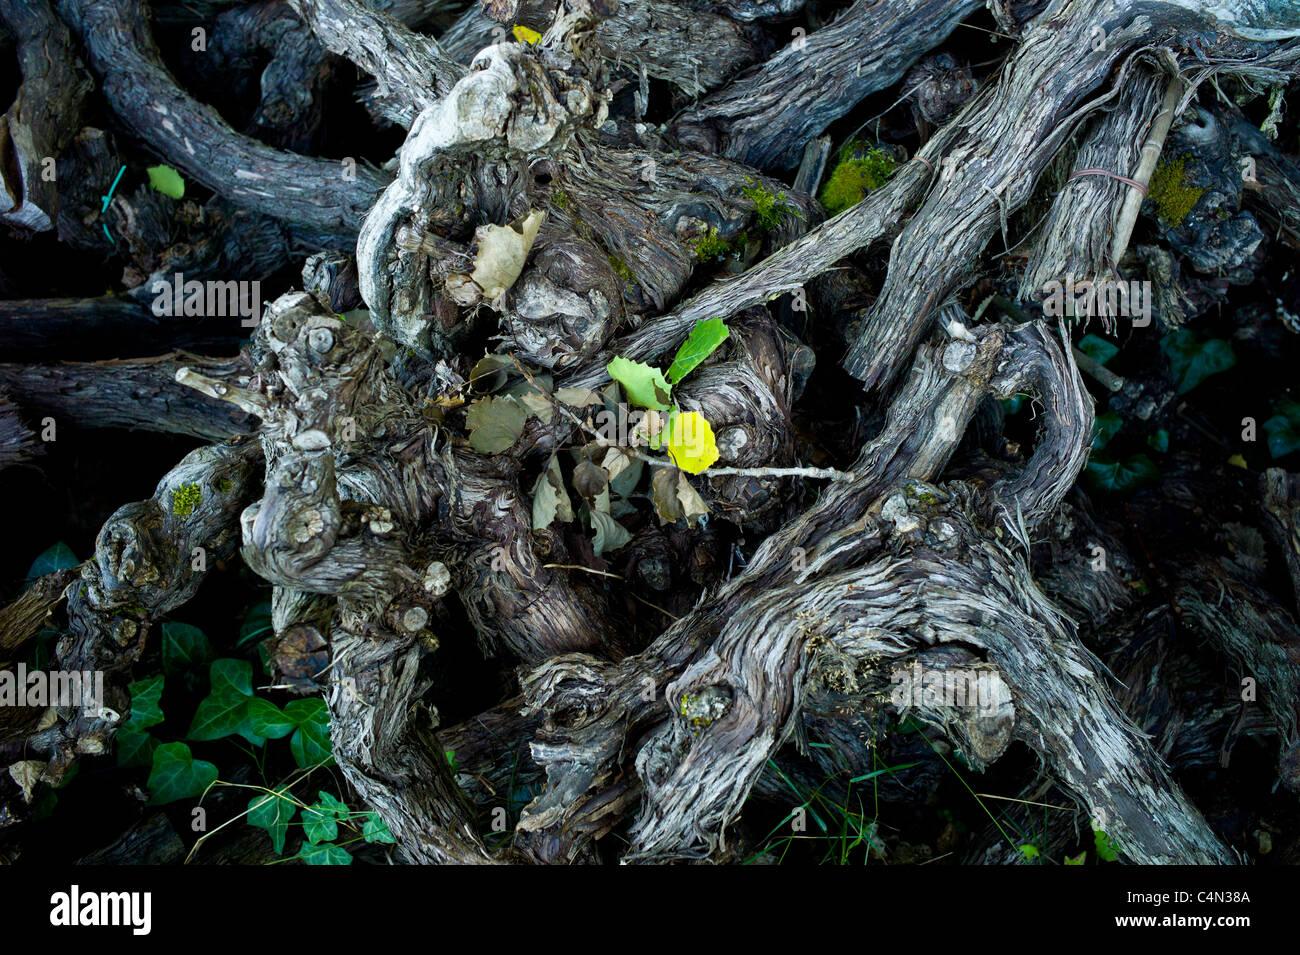 Old pruned vine stalks in wine region of Bordeaux, France - Stock Image